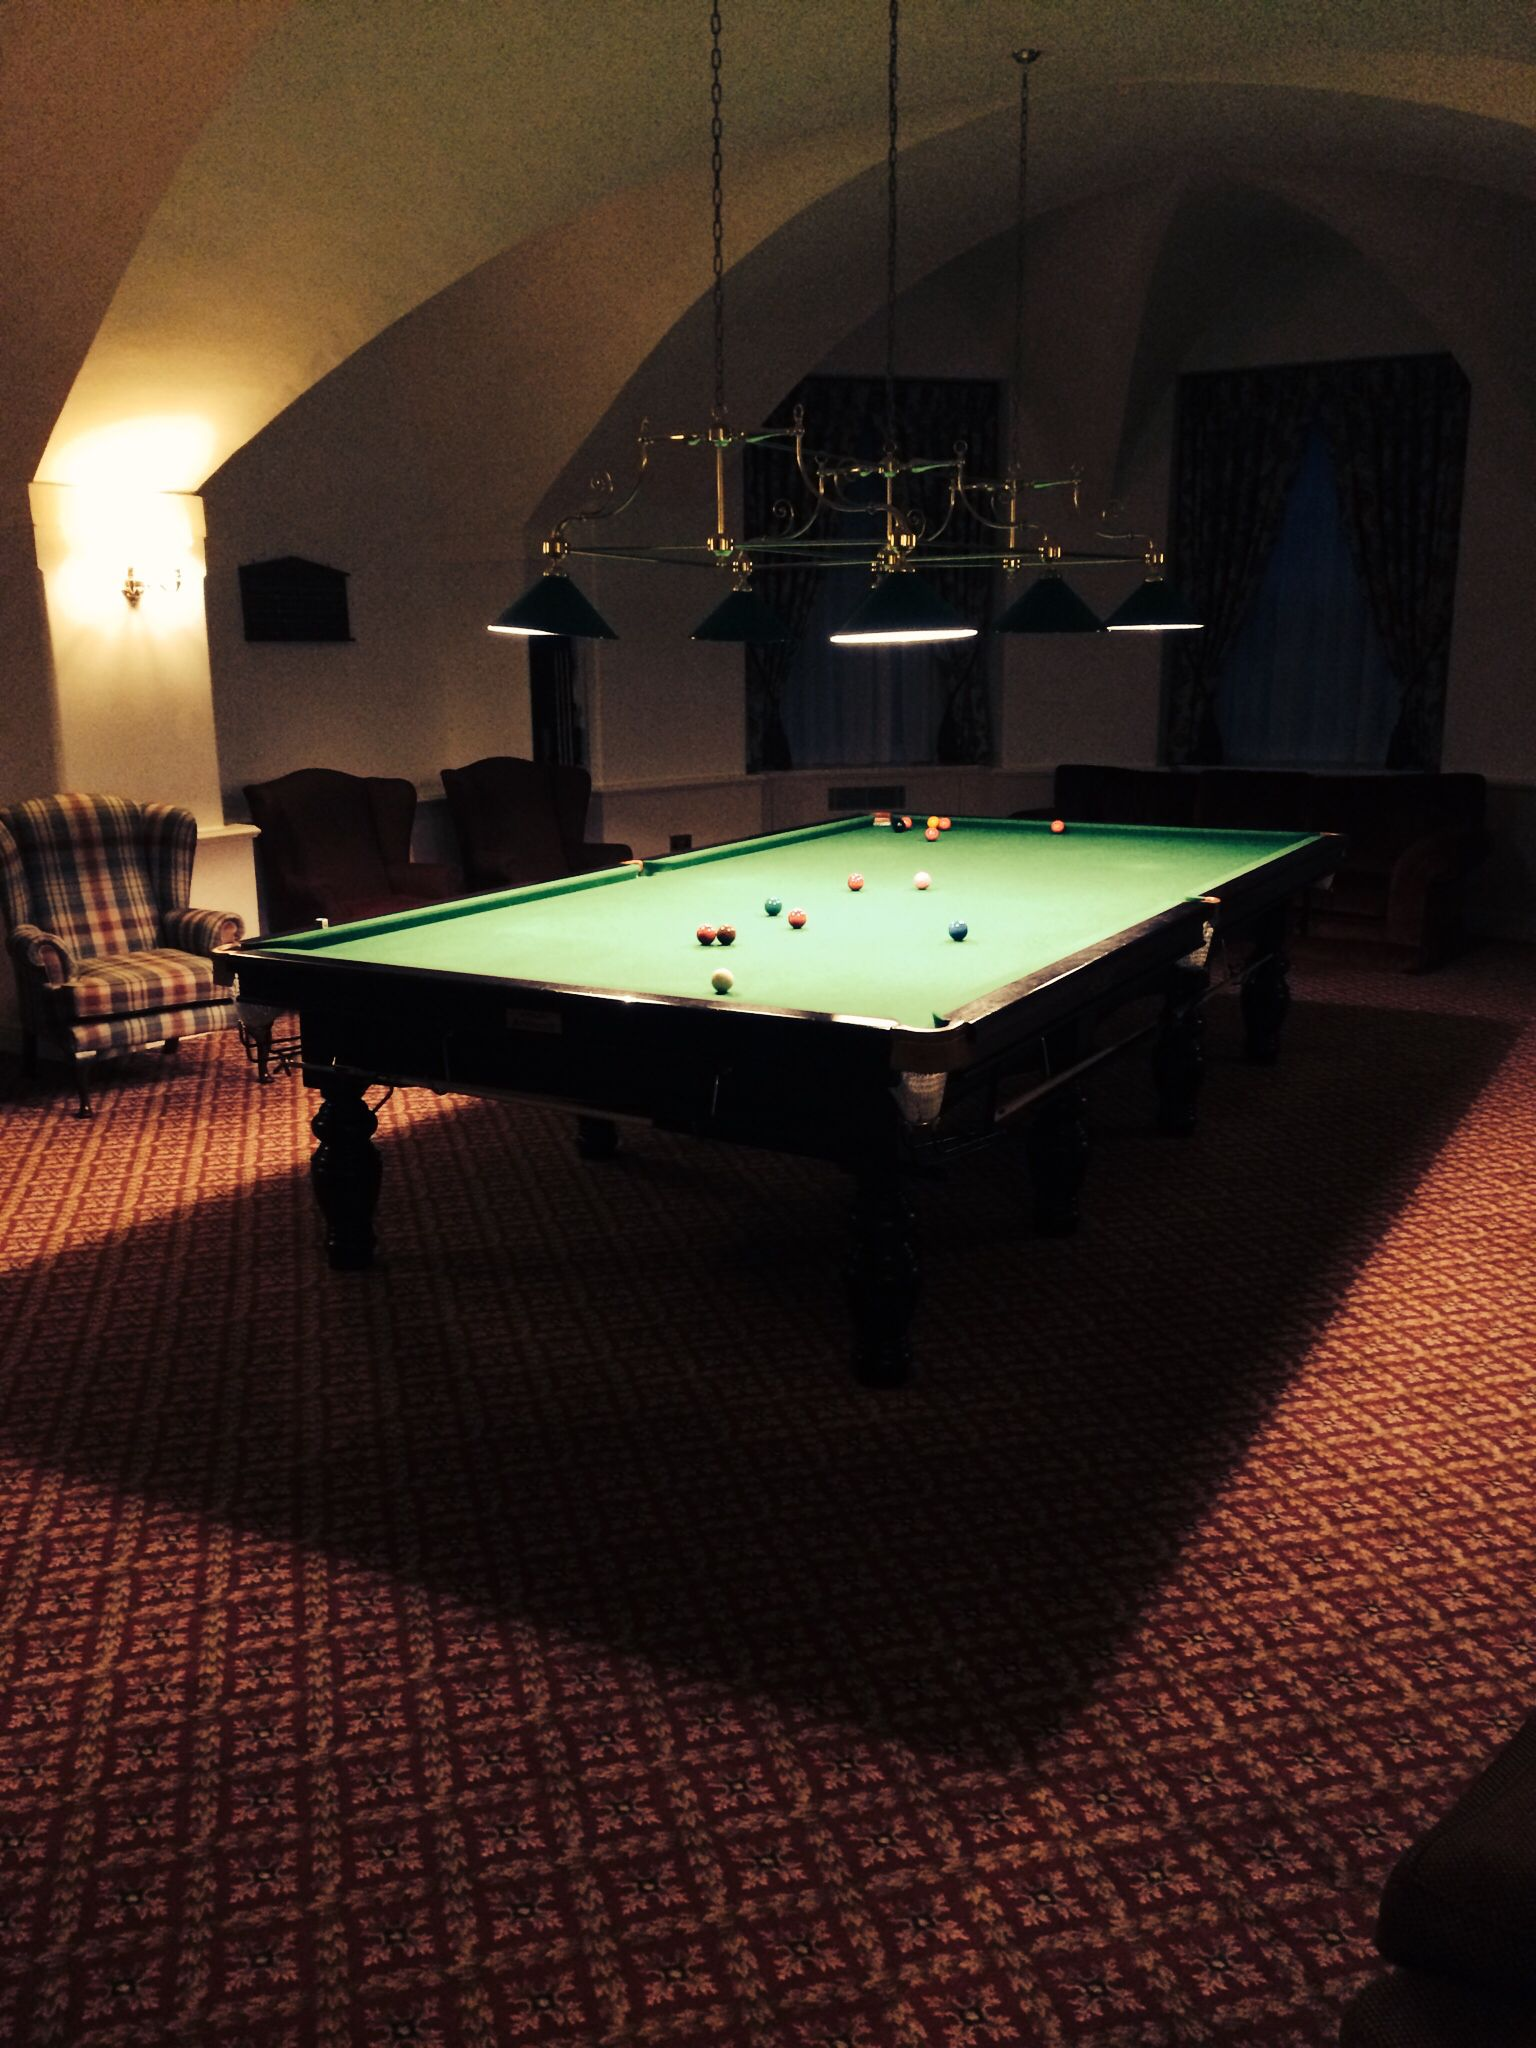 Snooker Room Snooker Room Billiard Room Billiards